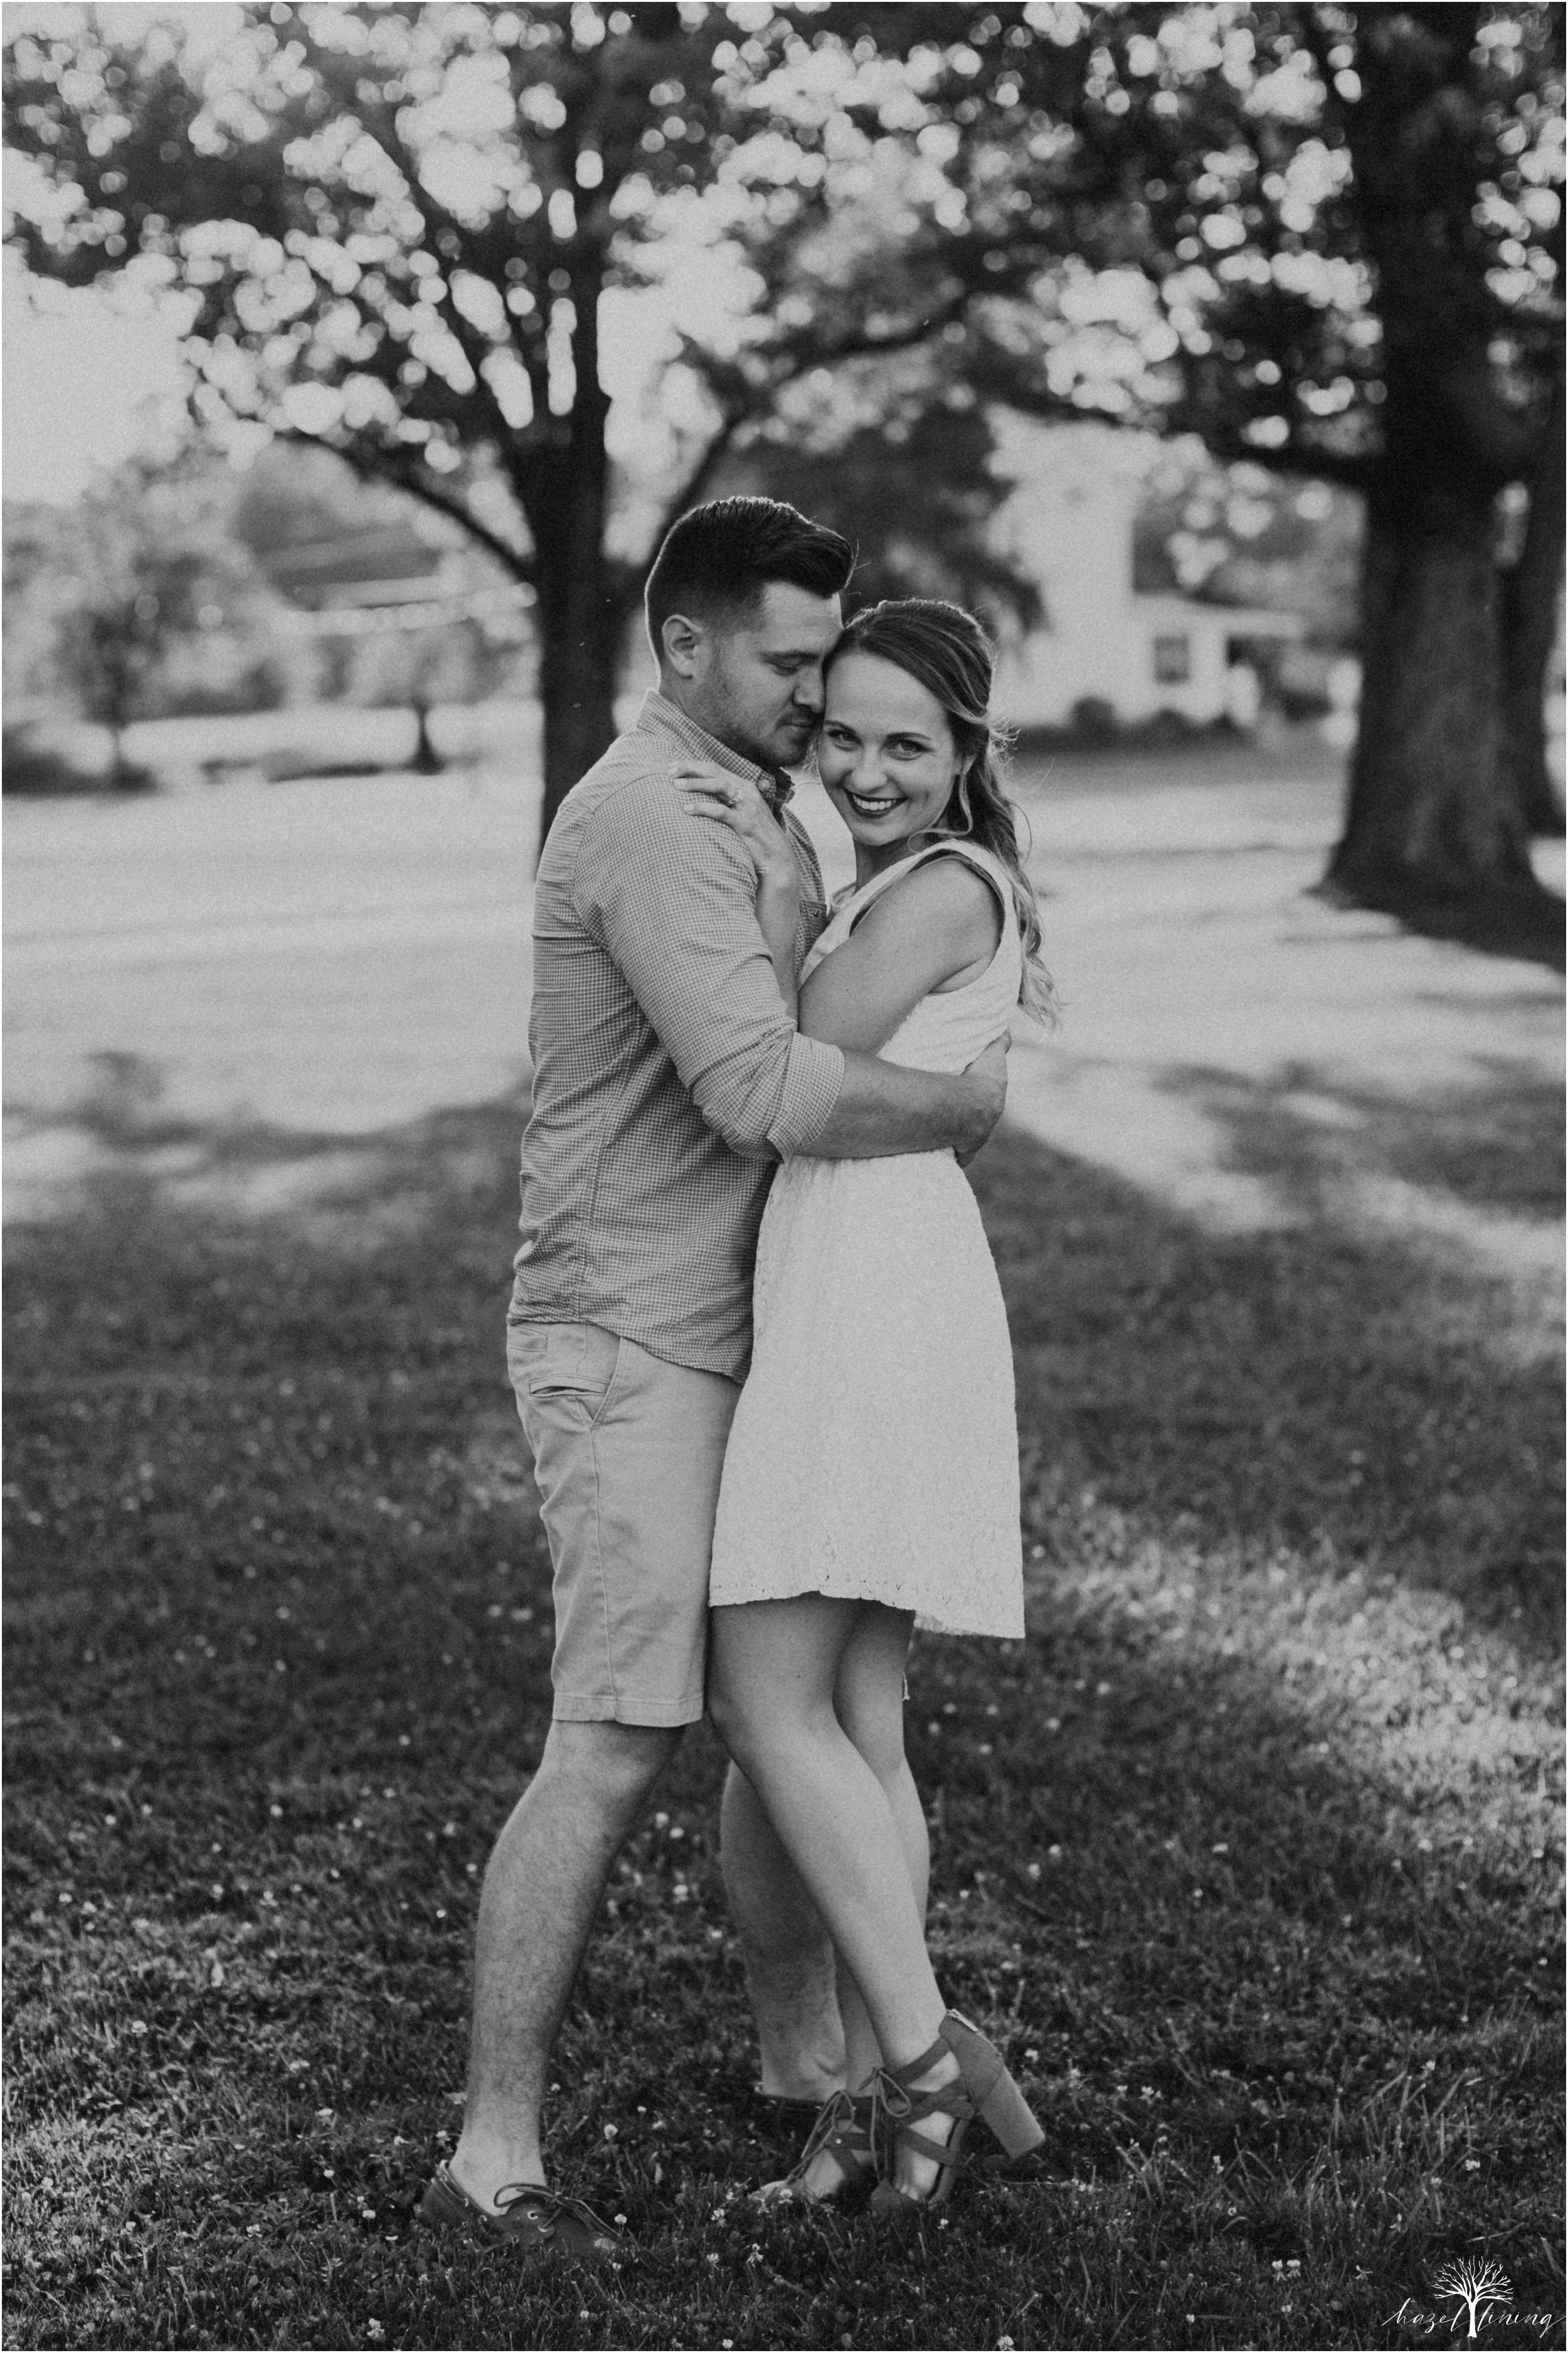 rachel-warner-chris-niedrist-the-farm-bakery-and-events-quakertown-pa-summer-engagement-hazel-lining-photography-destination-elopement-wedding-engagement-photography_0004.jpg